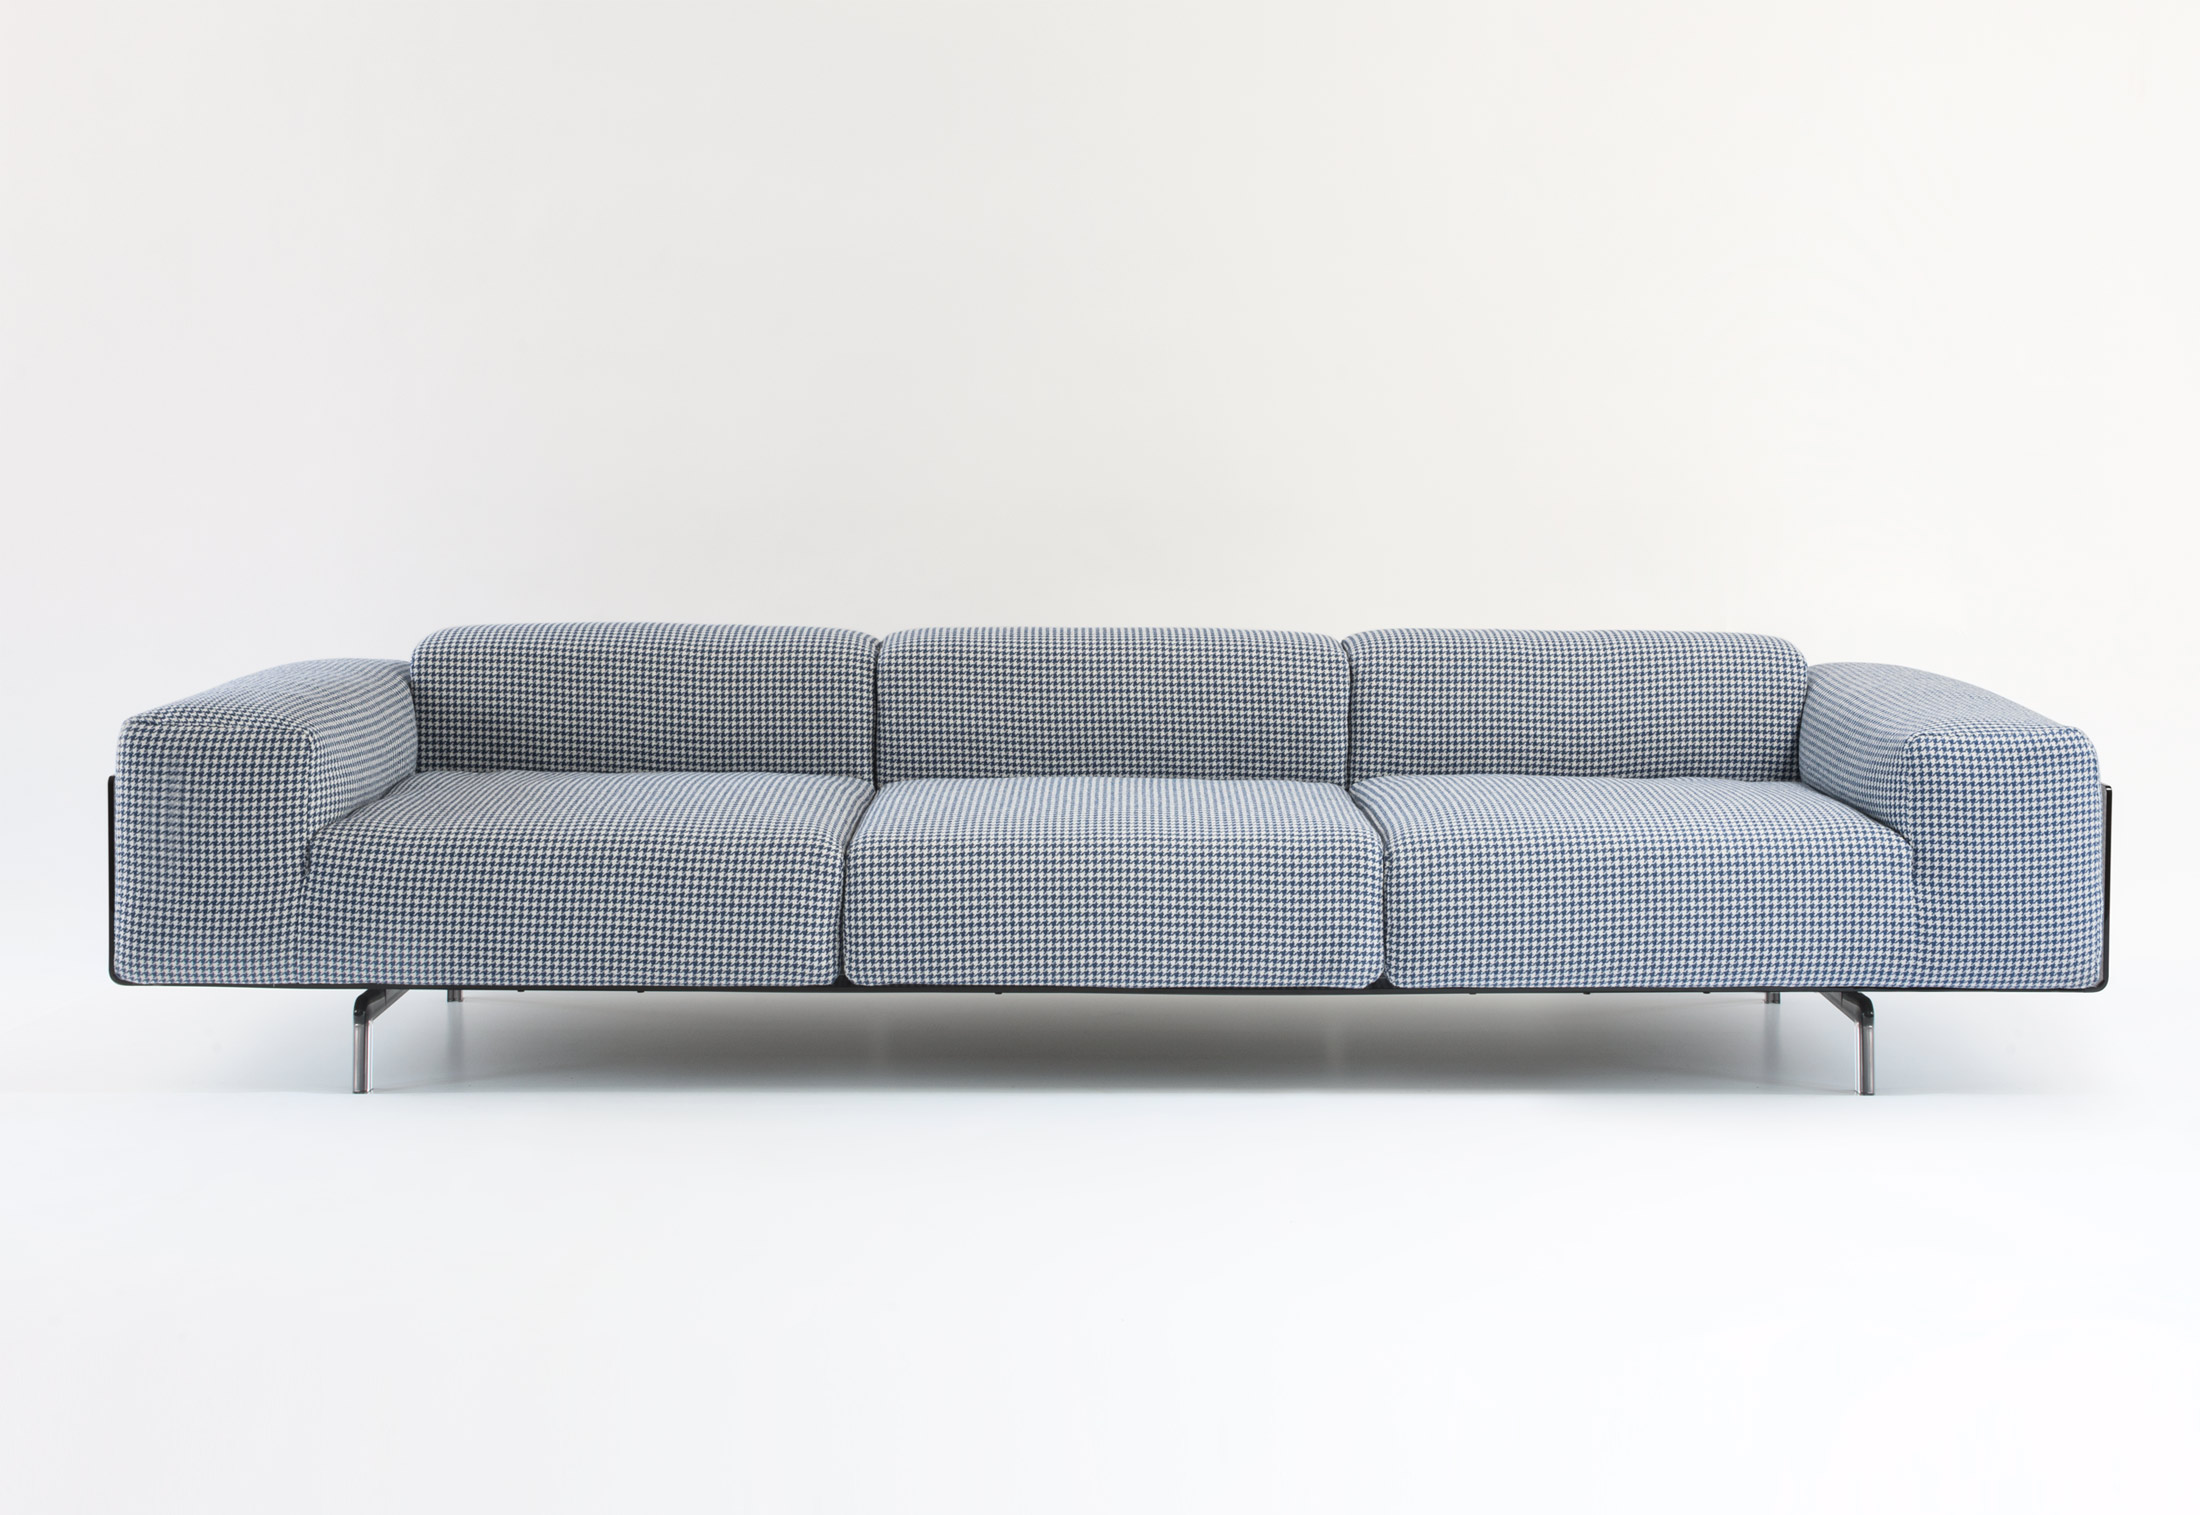 kartell sofa largo tyson leather by stylepark